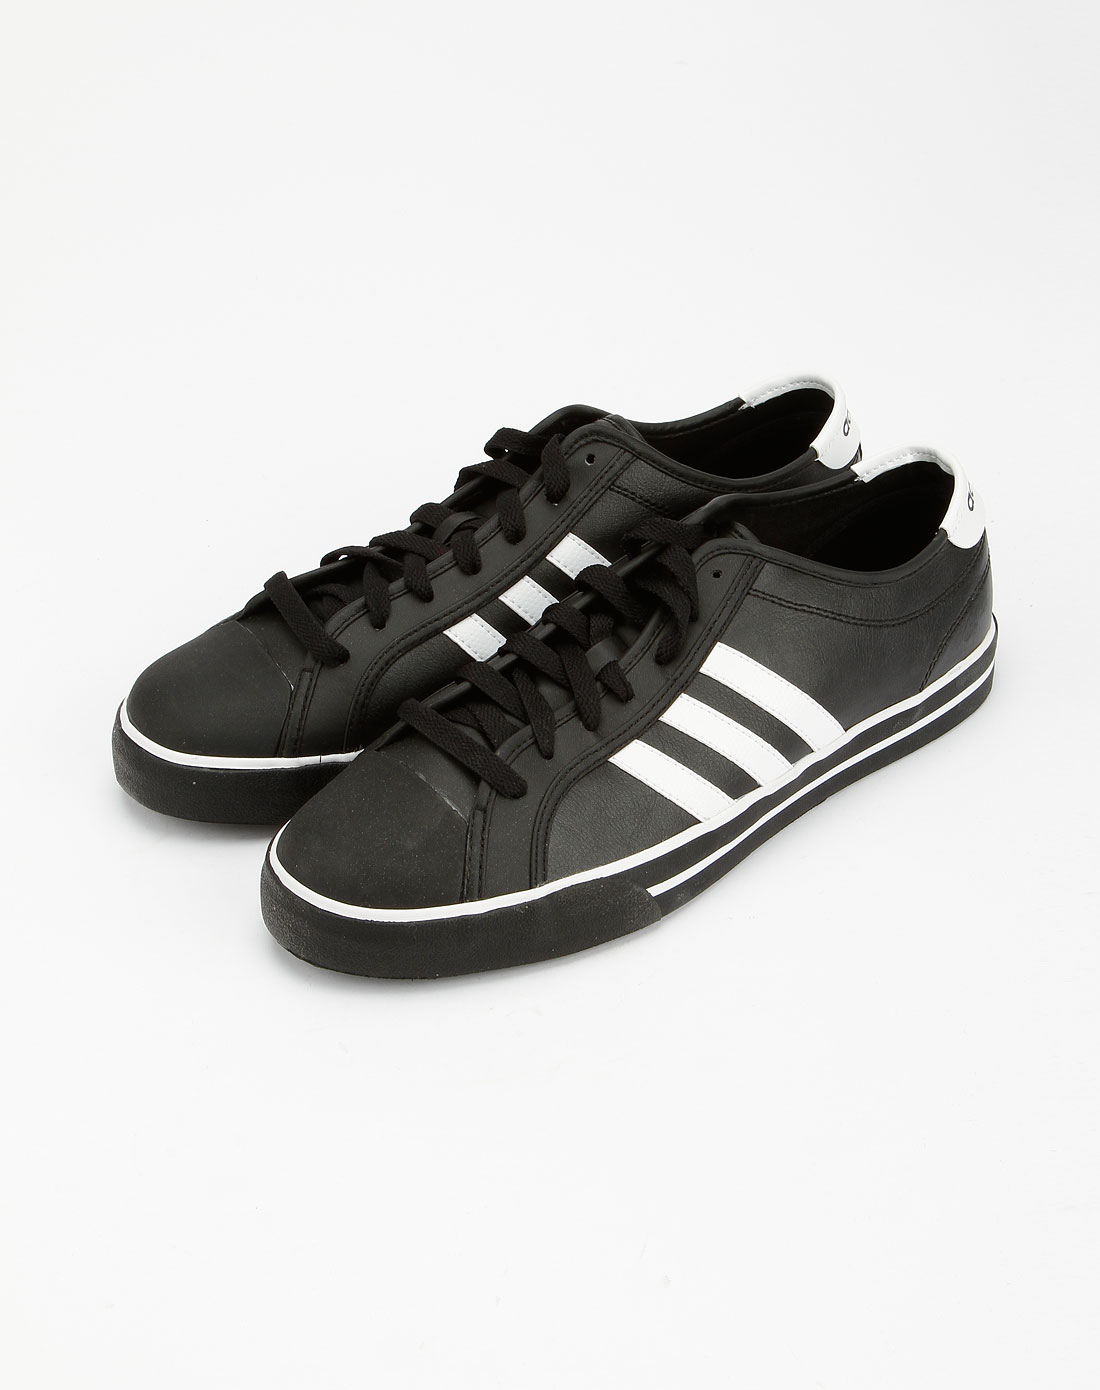 adidas neo男运动鞋